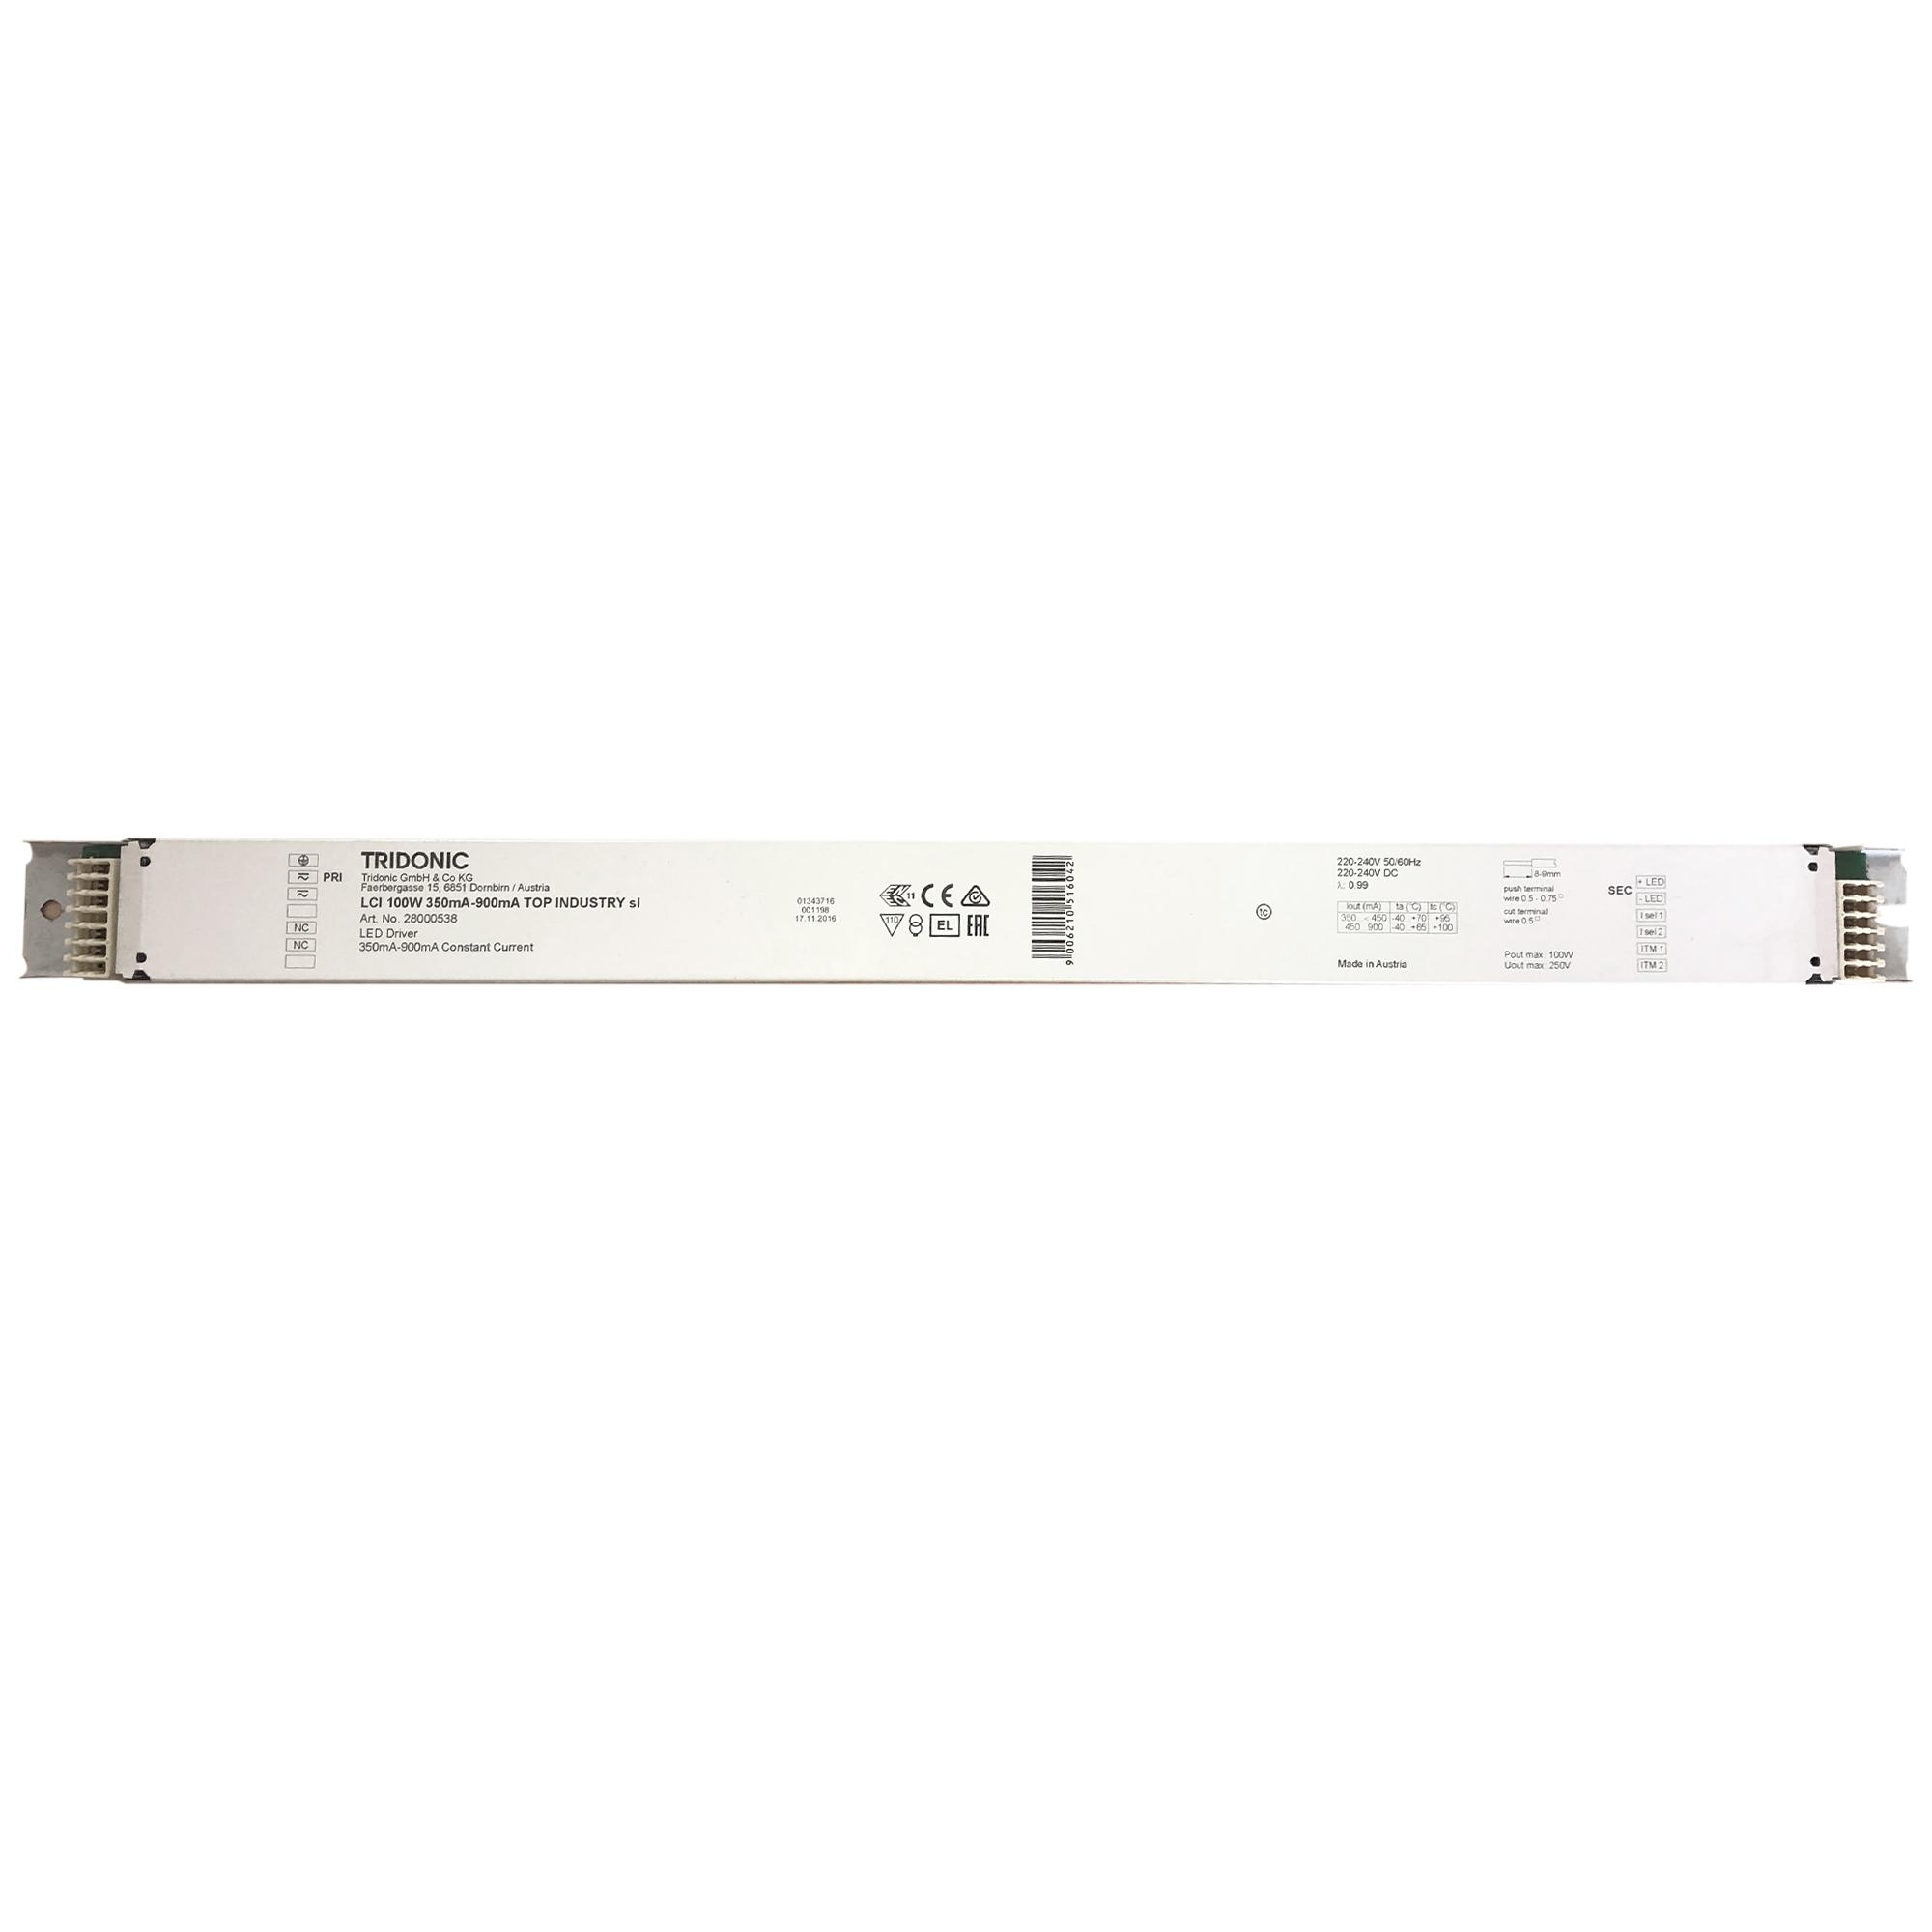 Tridonic LCI 100W 350mA-900mA Konstantstrom LED Trafo